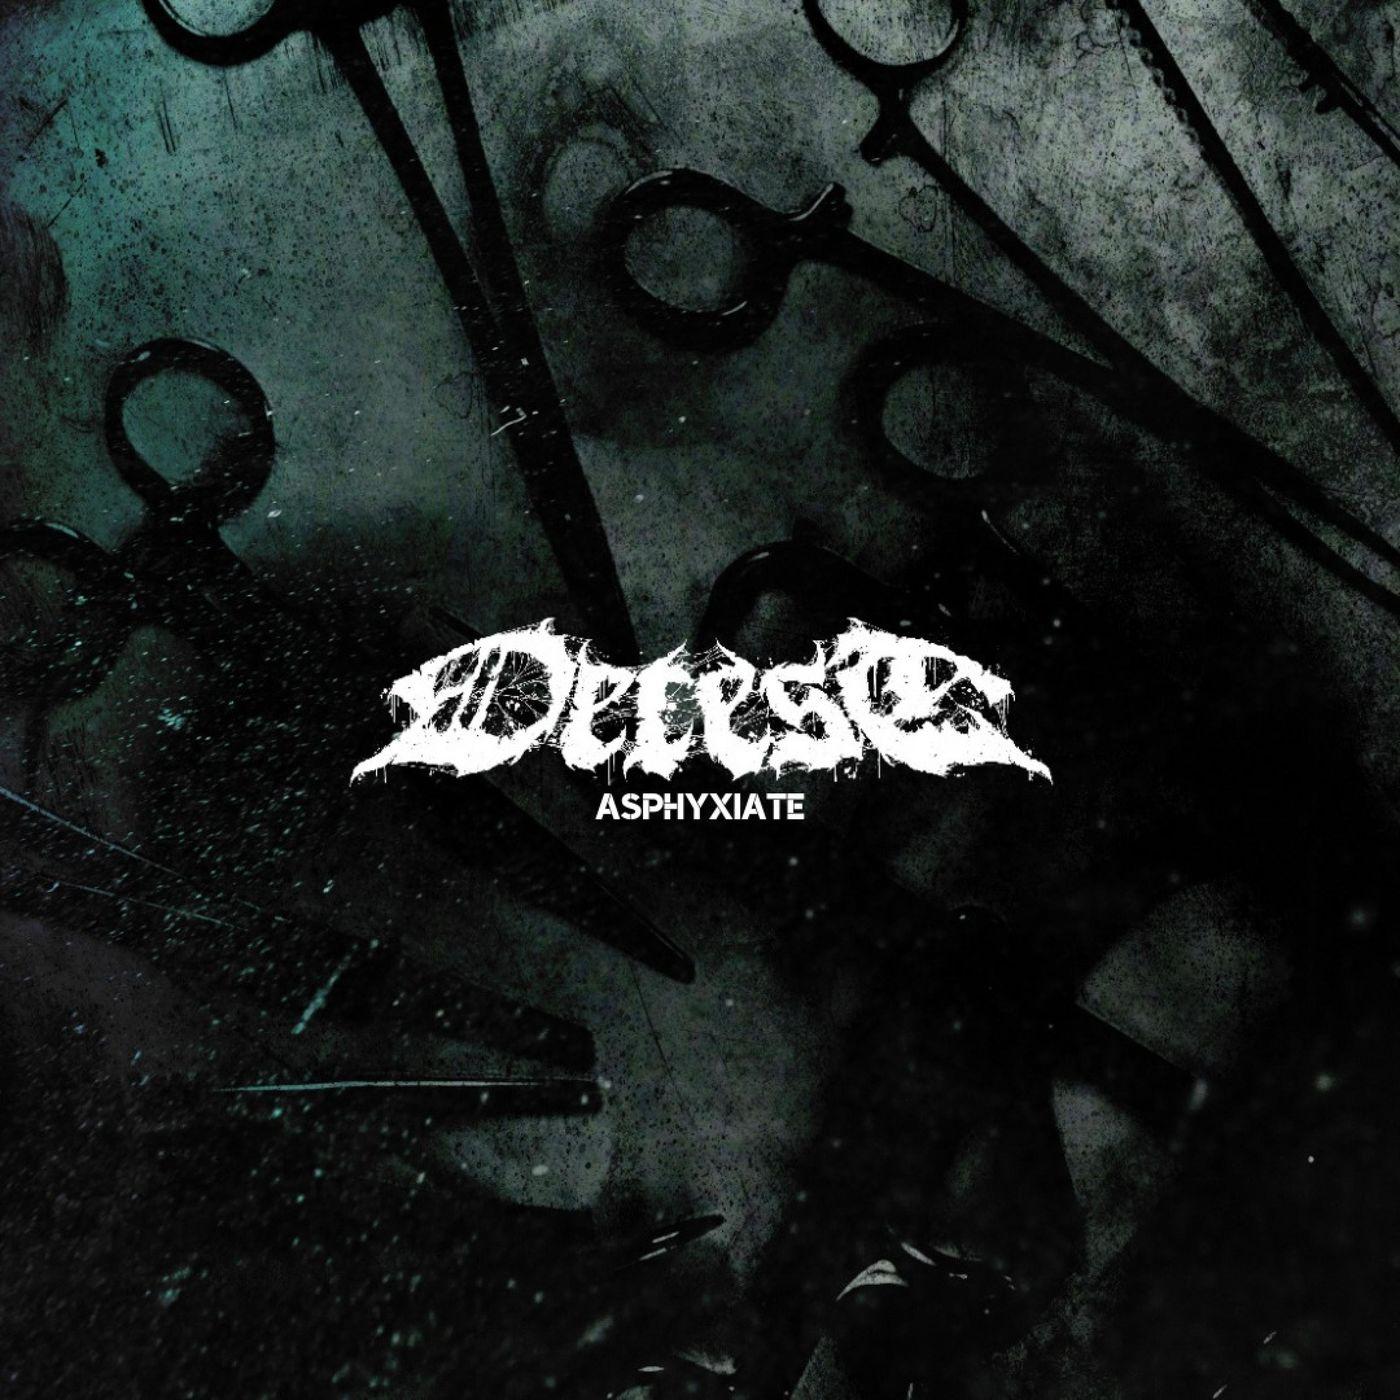 Detest - Asphyxiate [single] (2020)